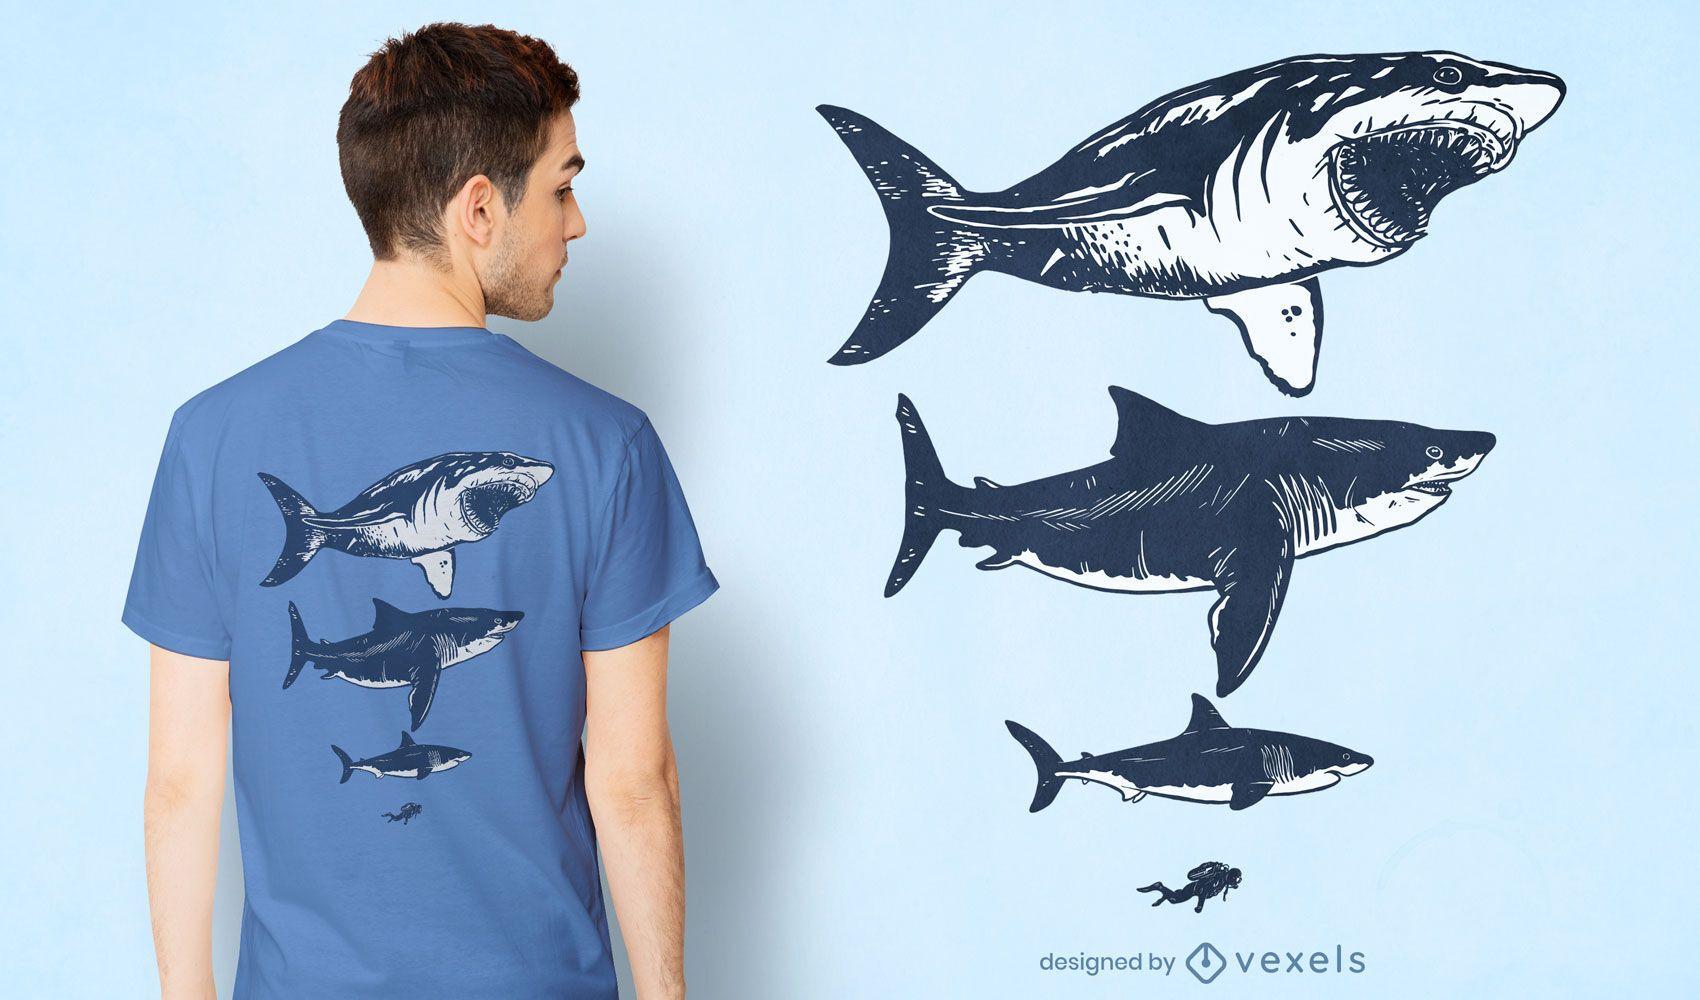 Sharks and diver t-shirt design